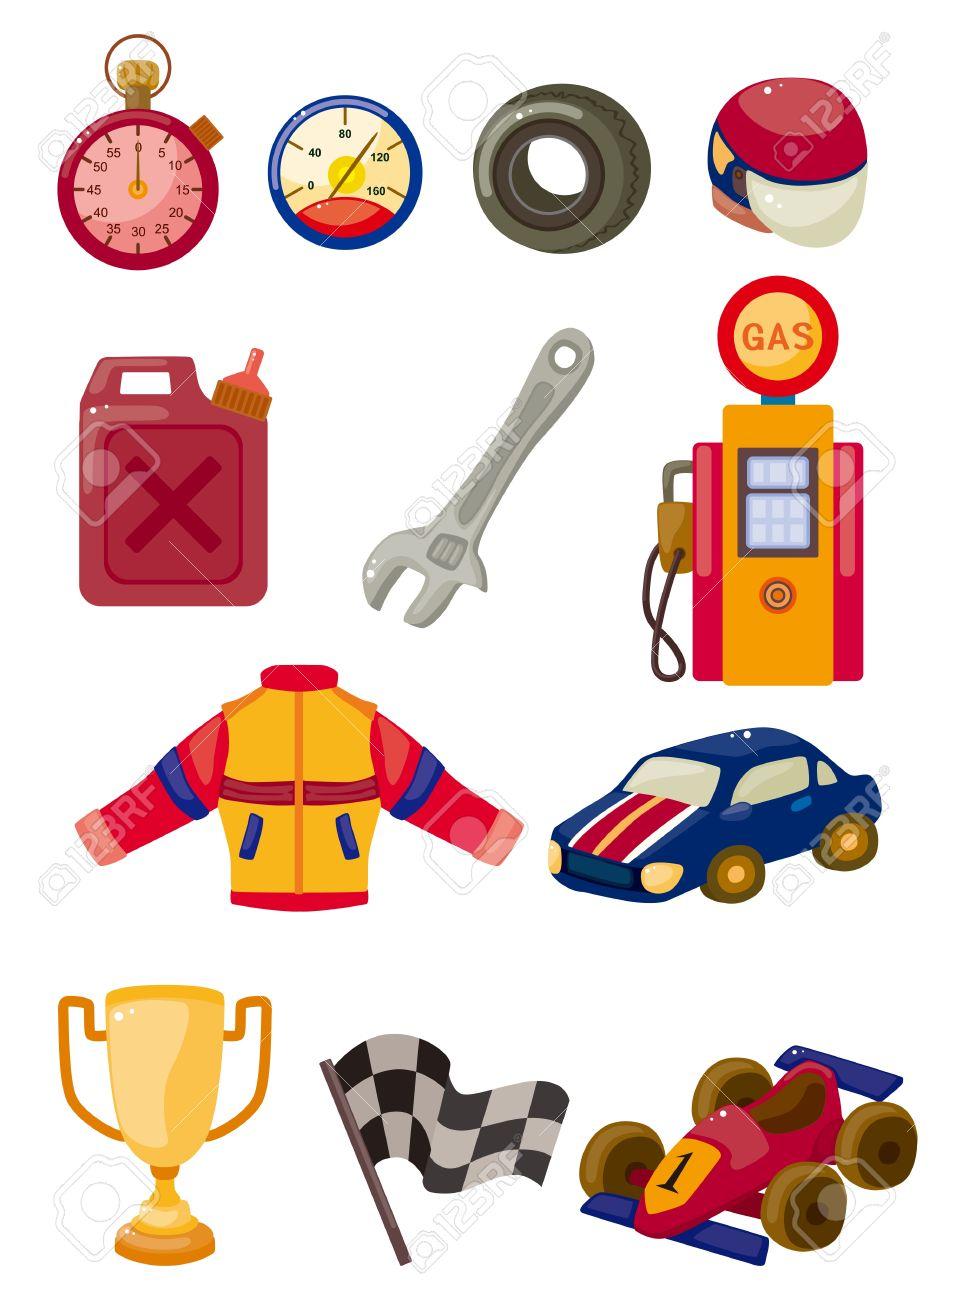 Cartoon F1 Car Racing Icon Set Royalty Free Cliparts Vectors And Stock Illustration Image 10695179